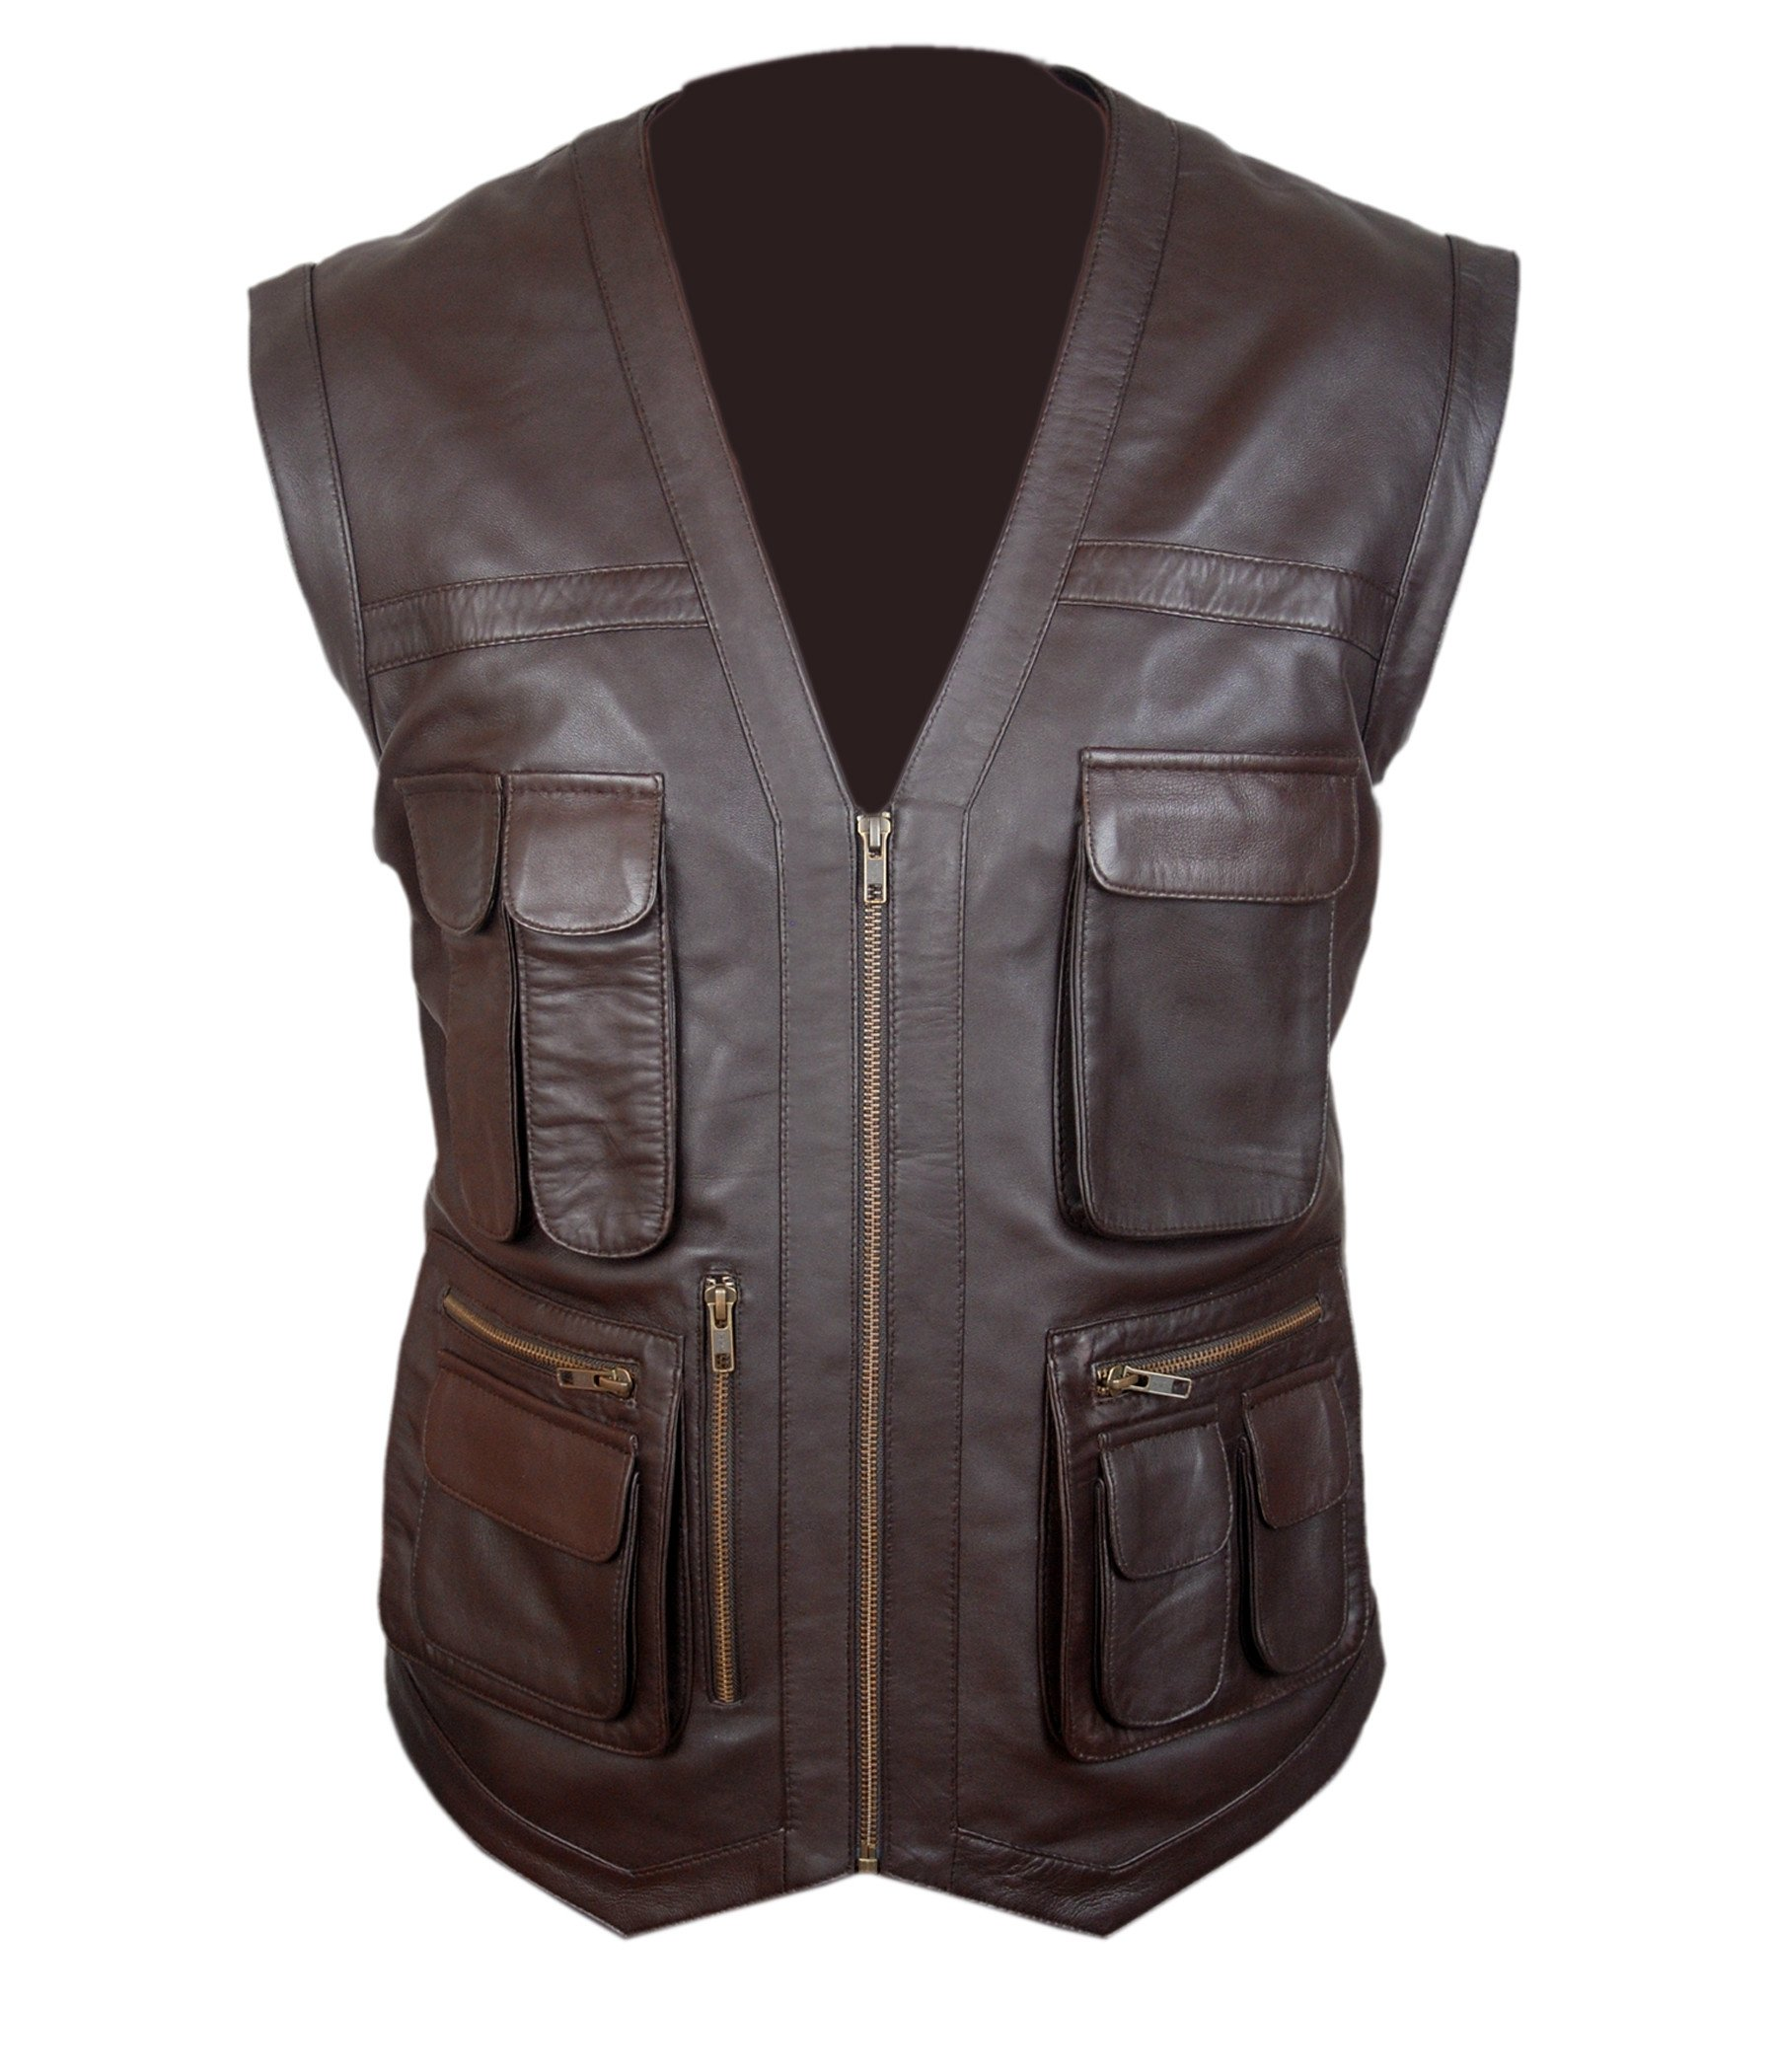 F&H Boy's Jurassic World Chris Pratt Owen Grady Genuine Leather Vest XL Brown by Flesh & Hide